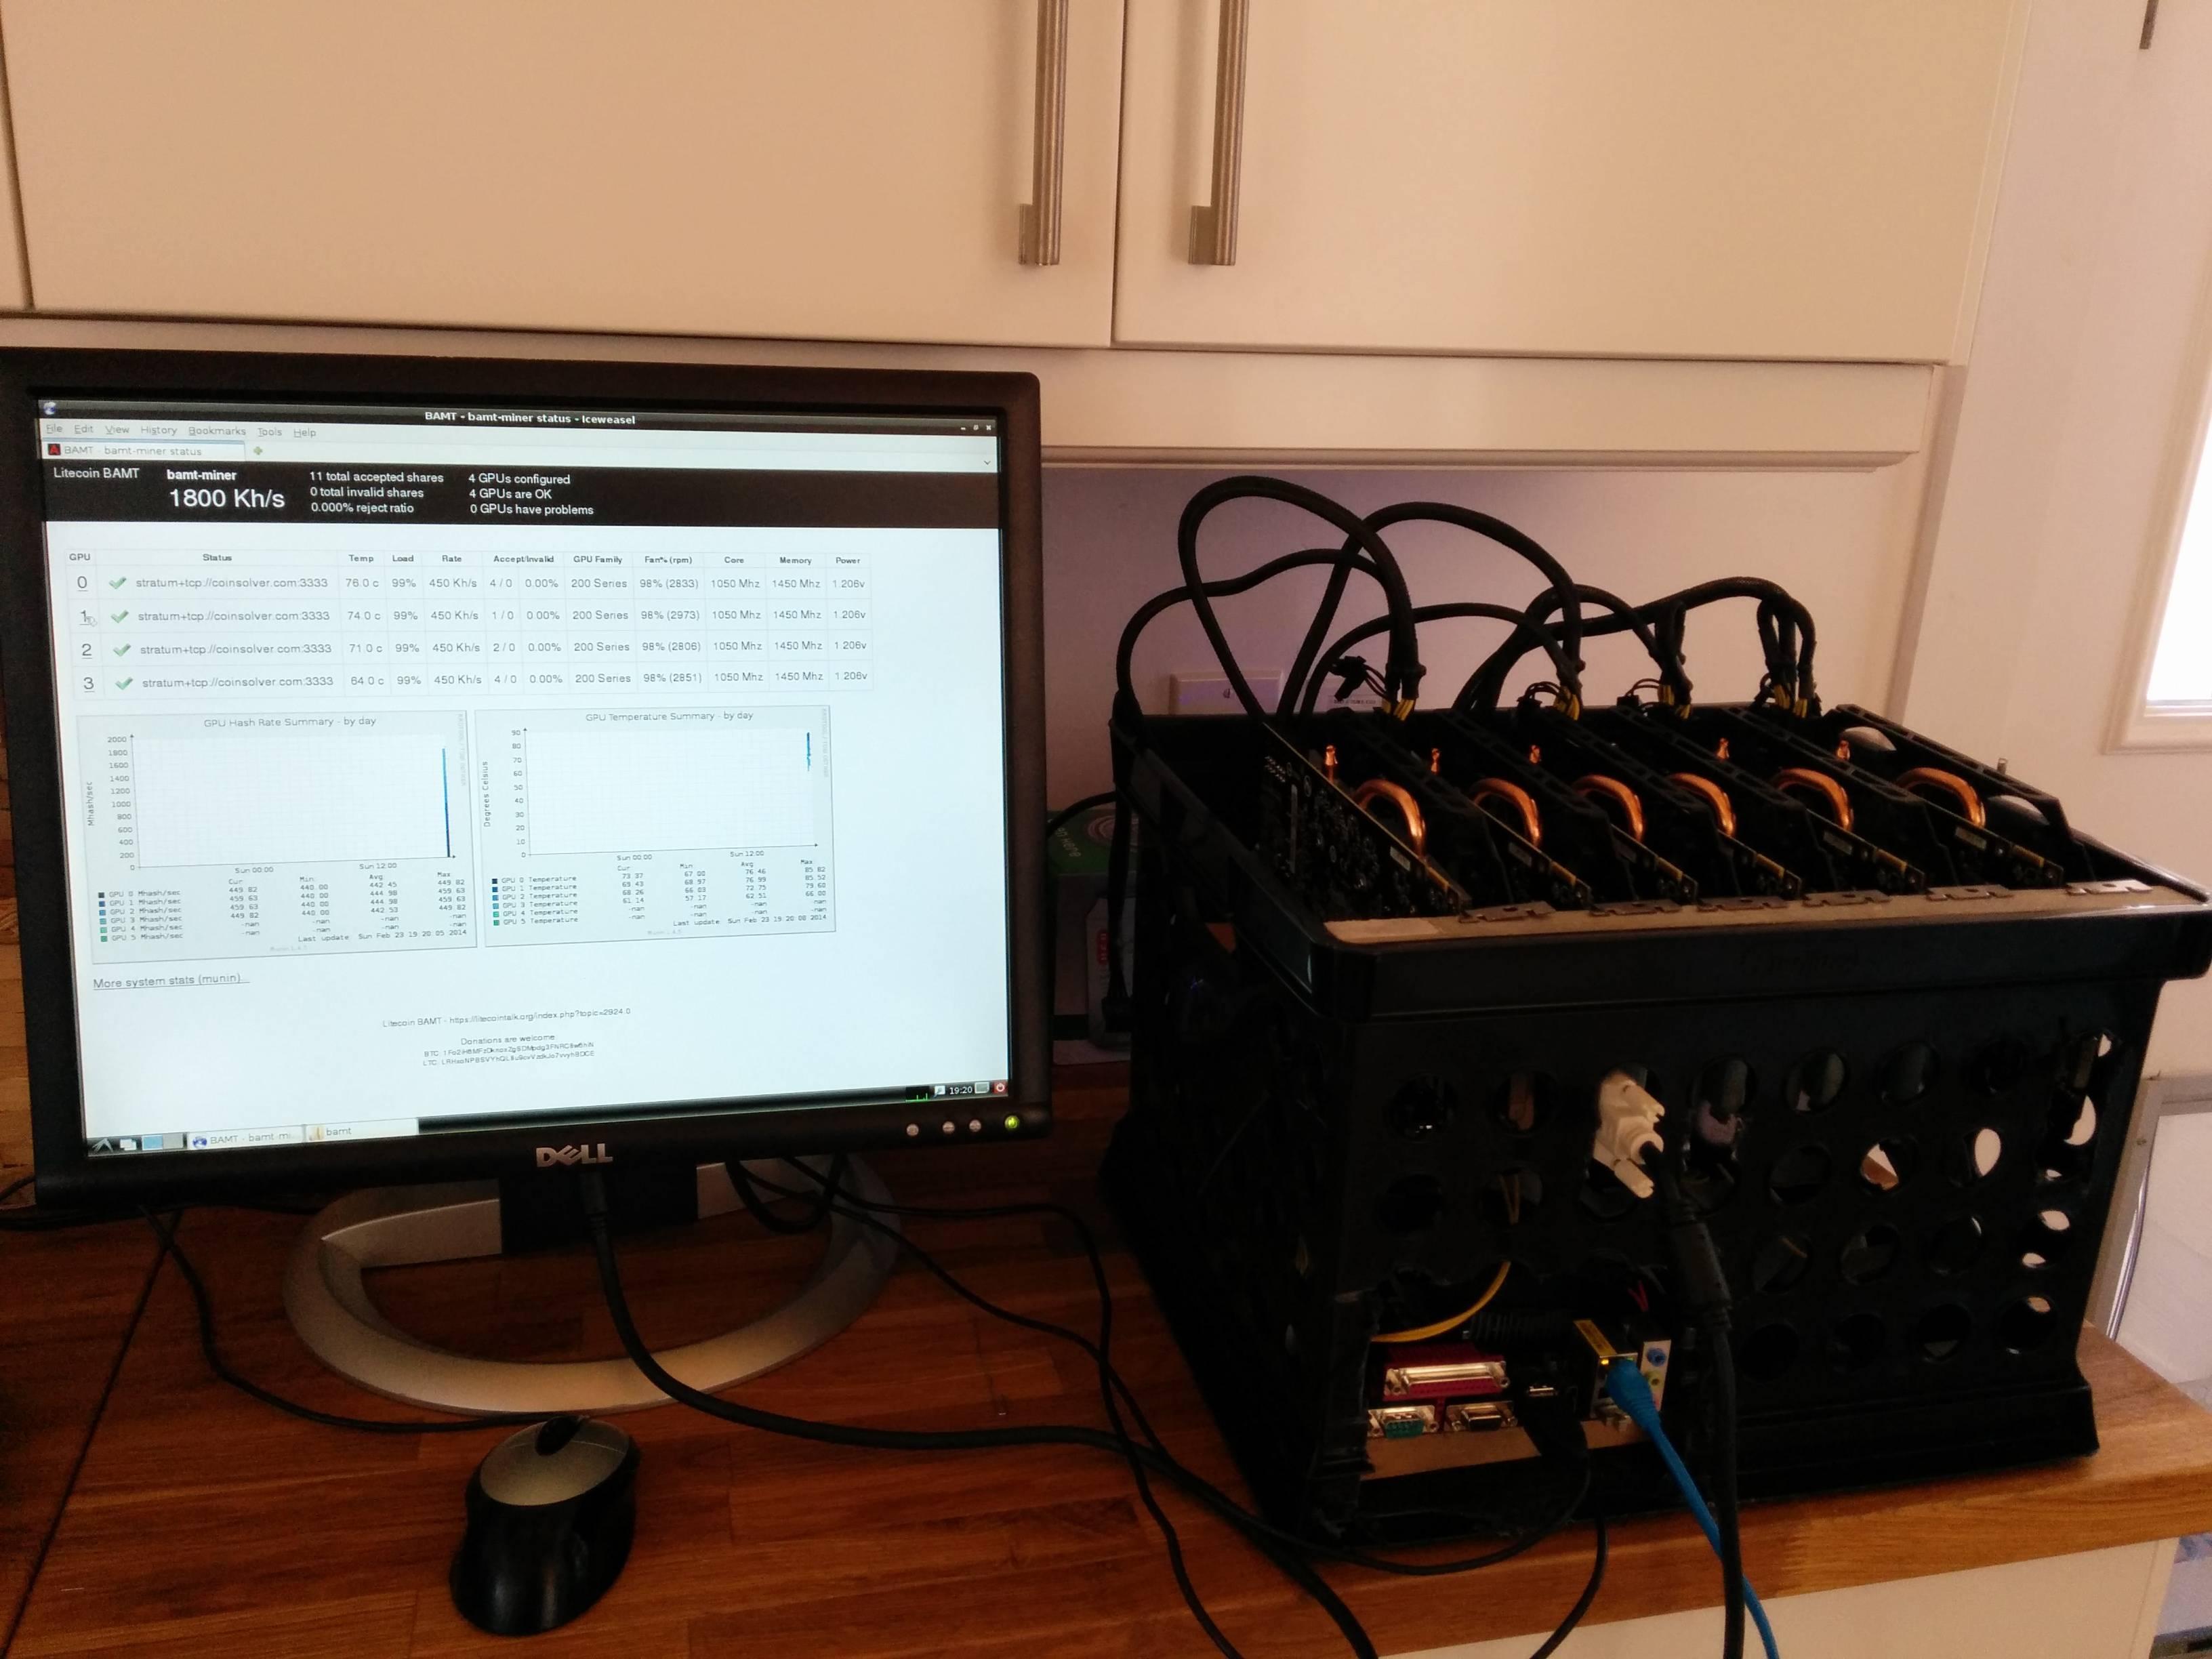 This is Lylepratt's Arscoin rig.